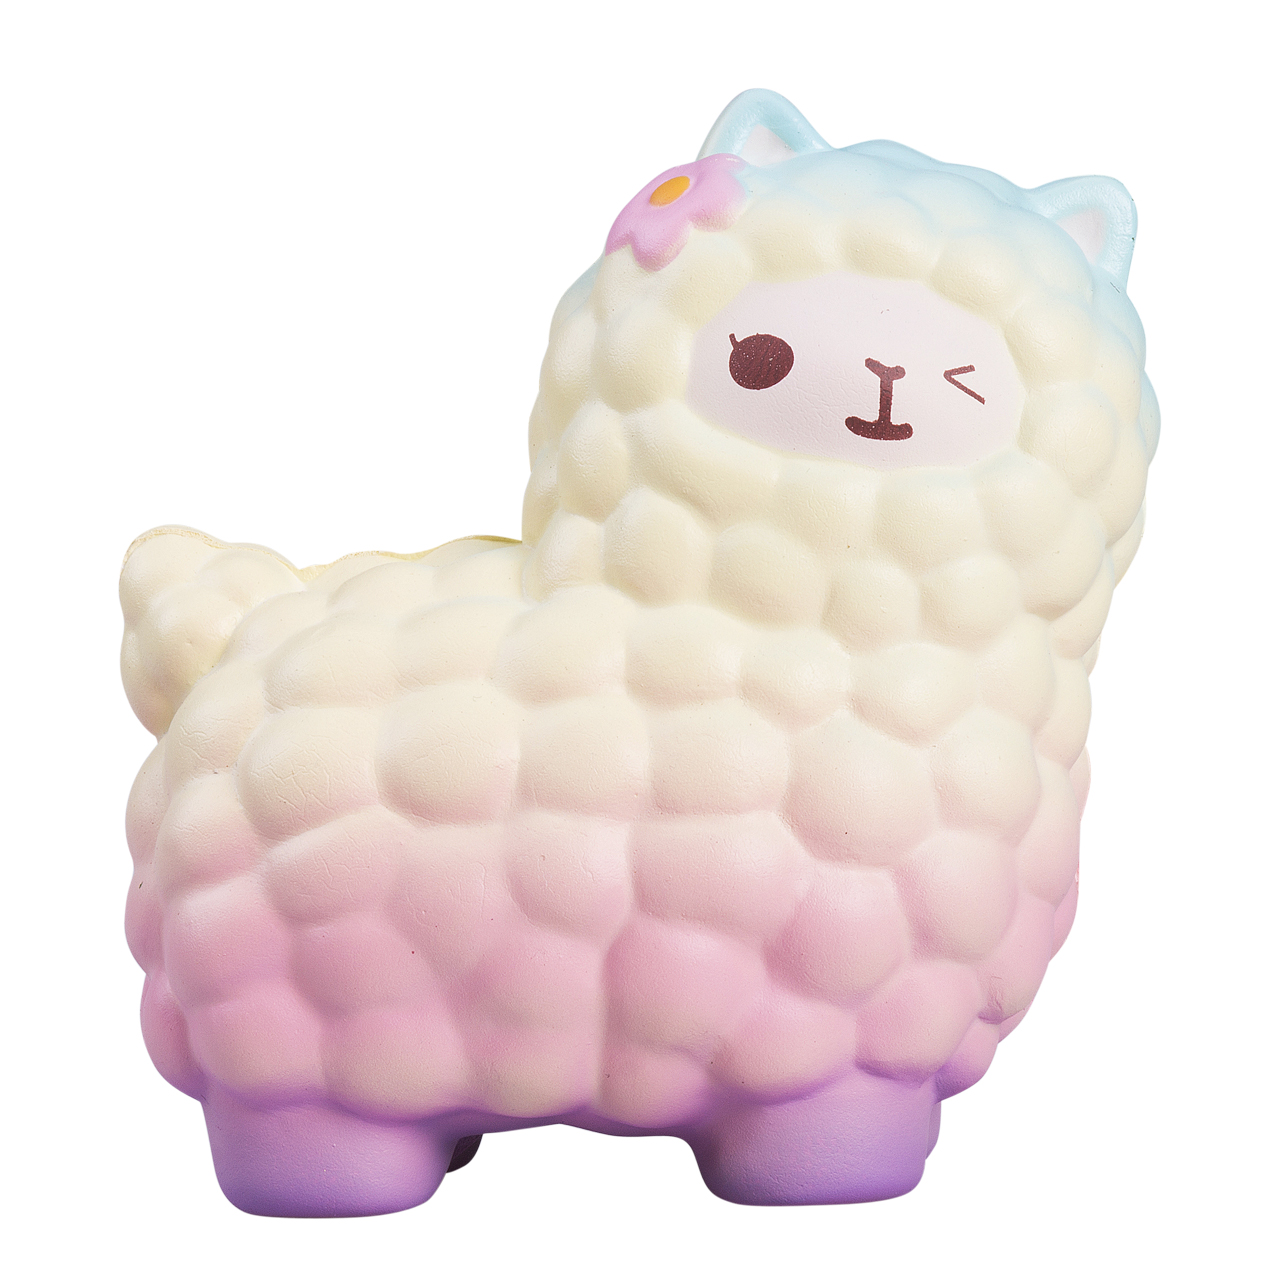 Kawaii Jumbo Sheep Alpaca Squishy Cute Slow Rising Animal Squishy Squish Wholesale Exquisite Kids Gift